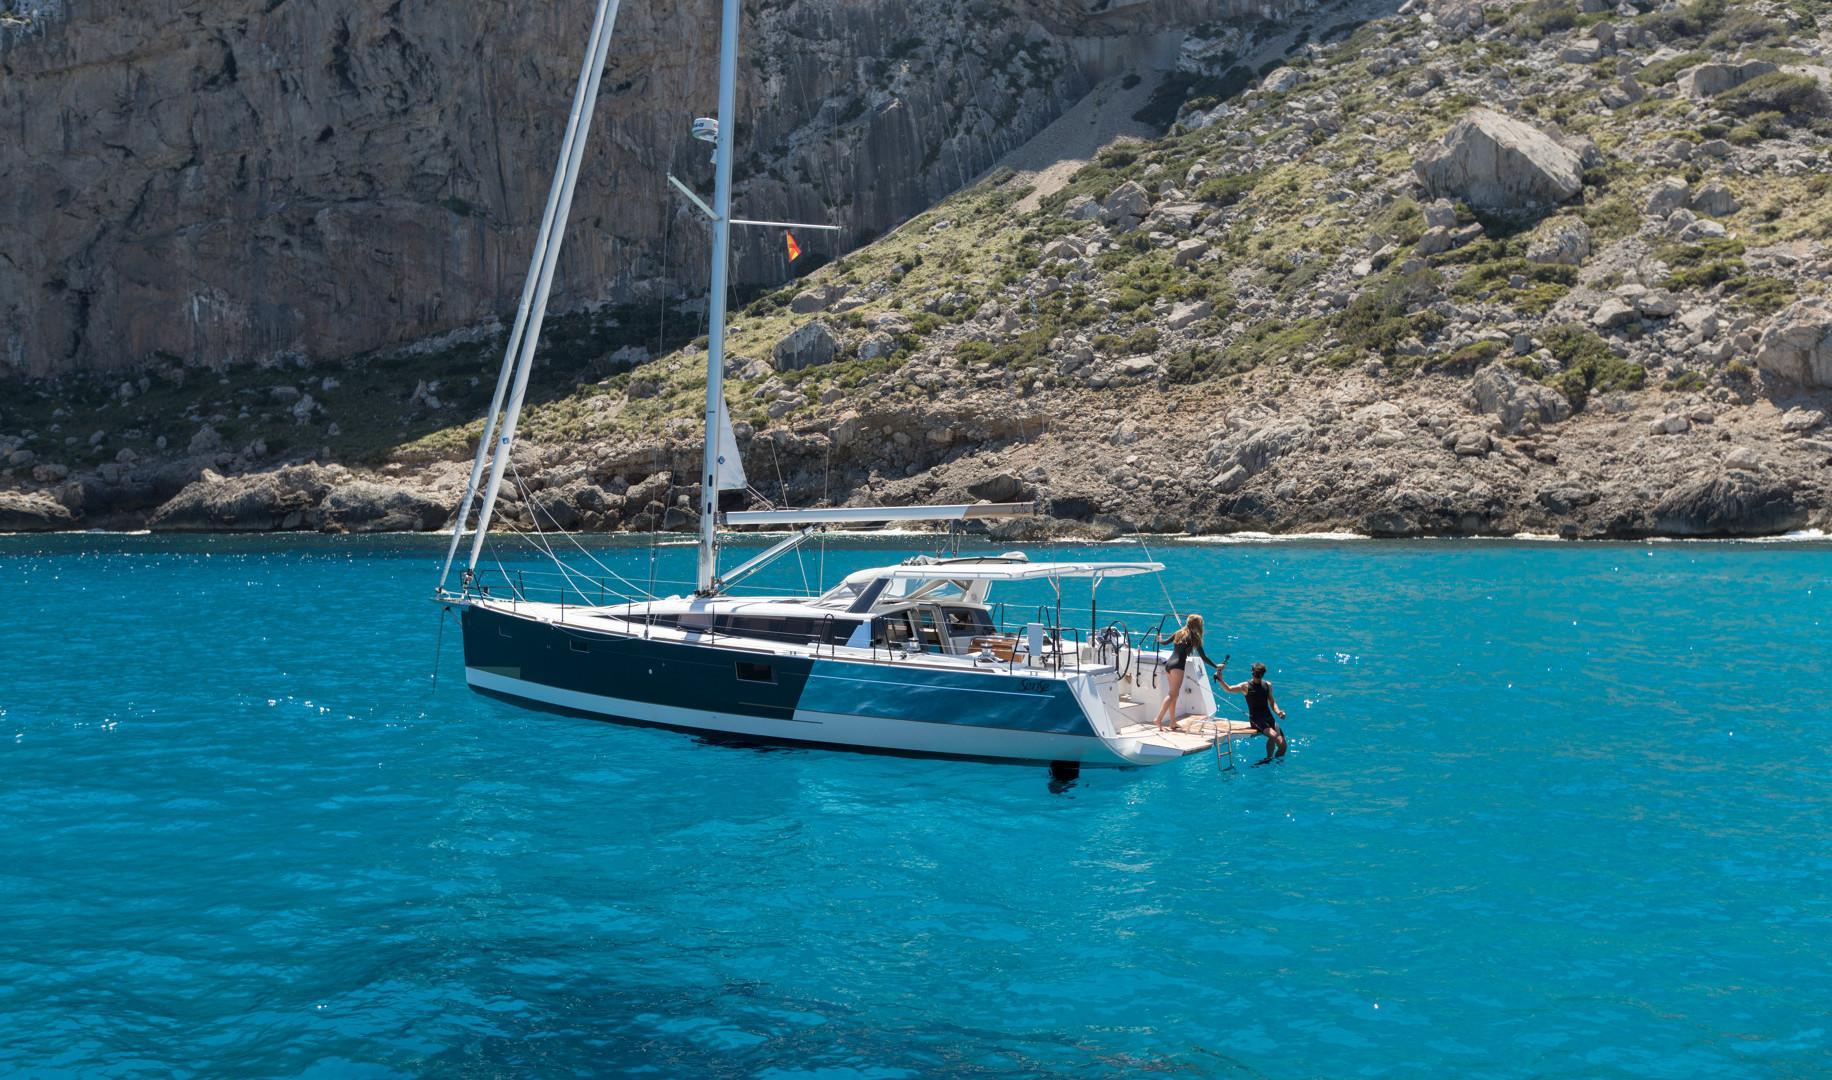 Sense 51 Sail  boat for sale Cape Town A